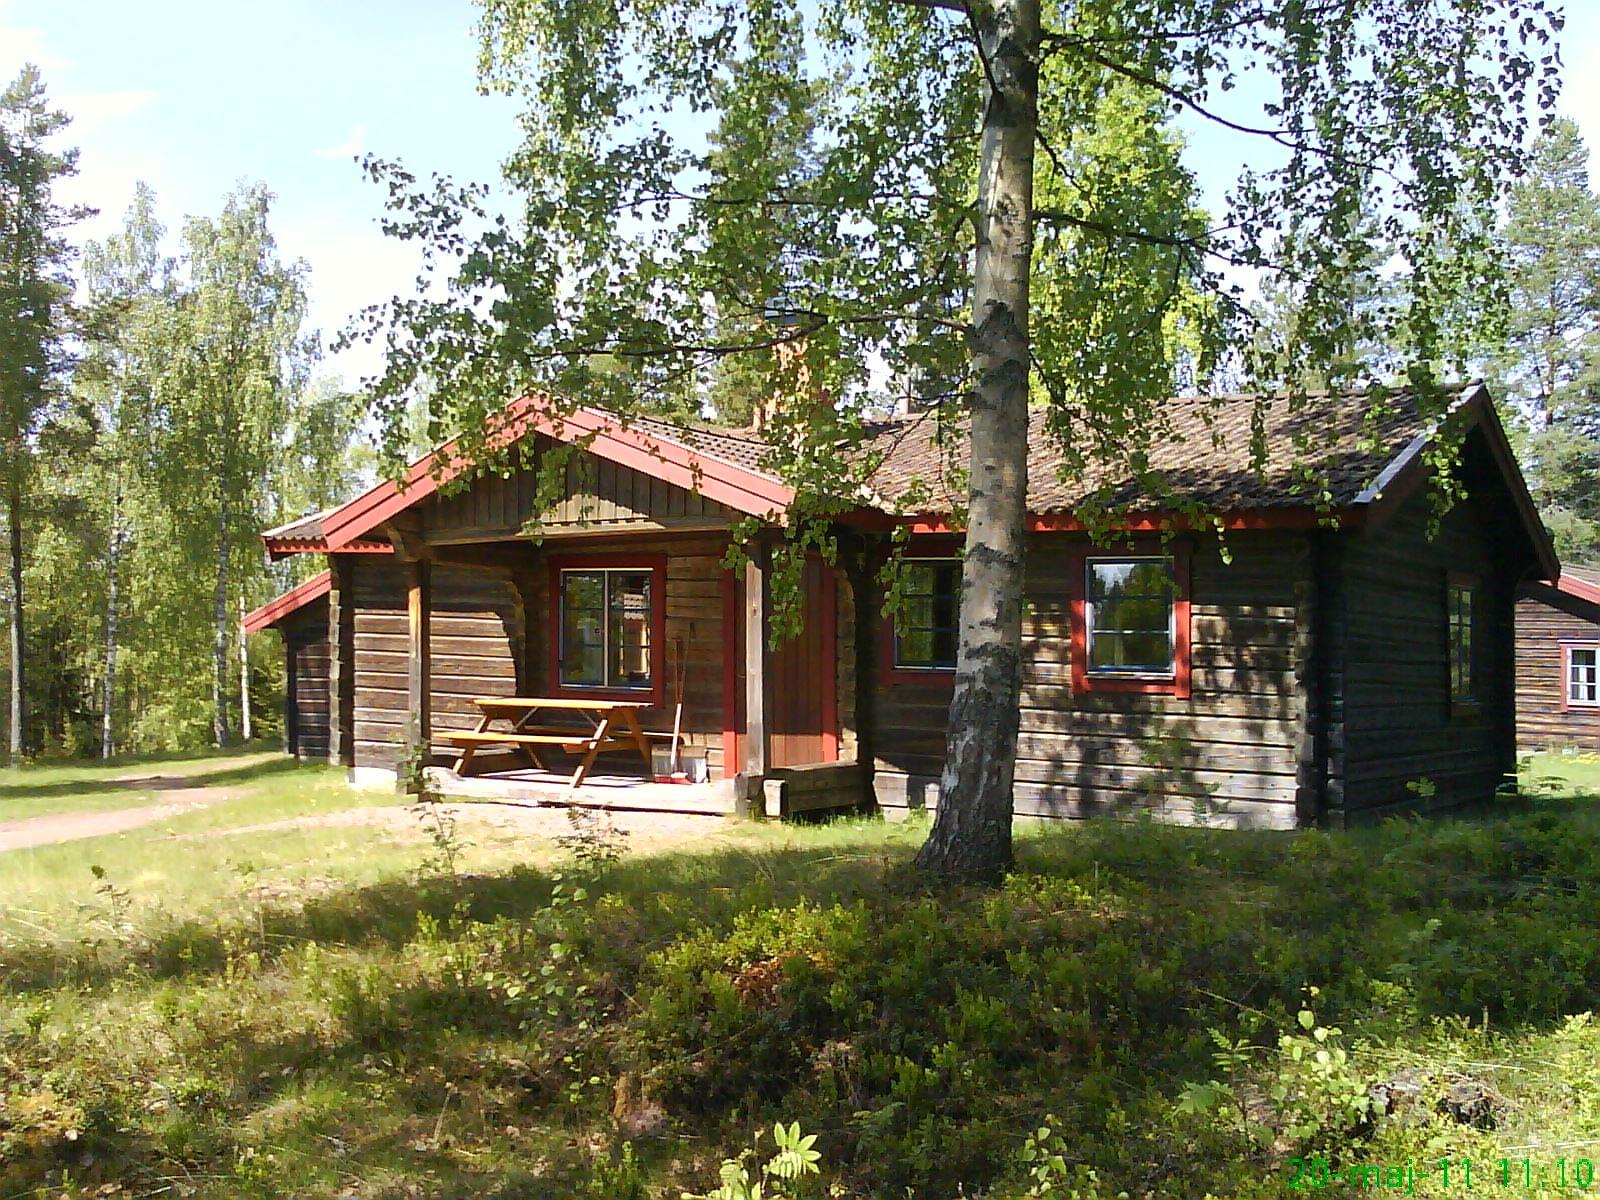 Siljansborgs Stugby i Rättvik